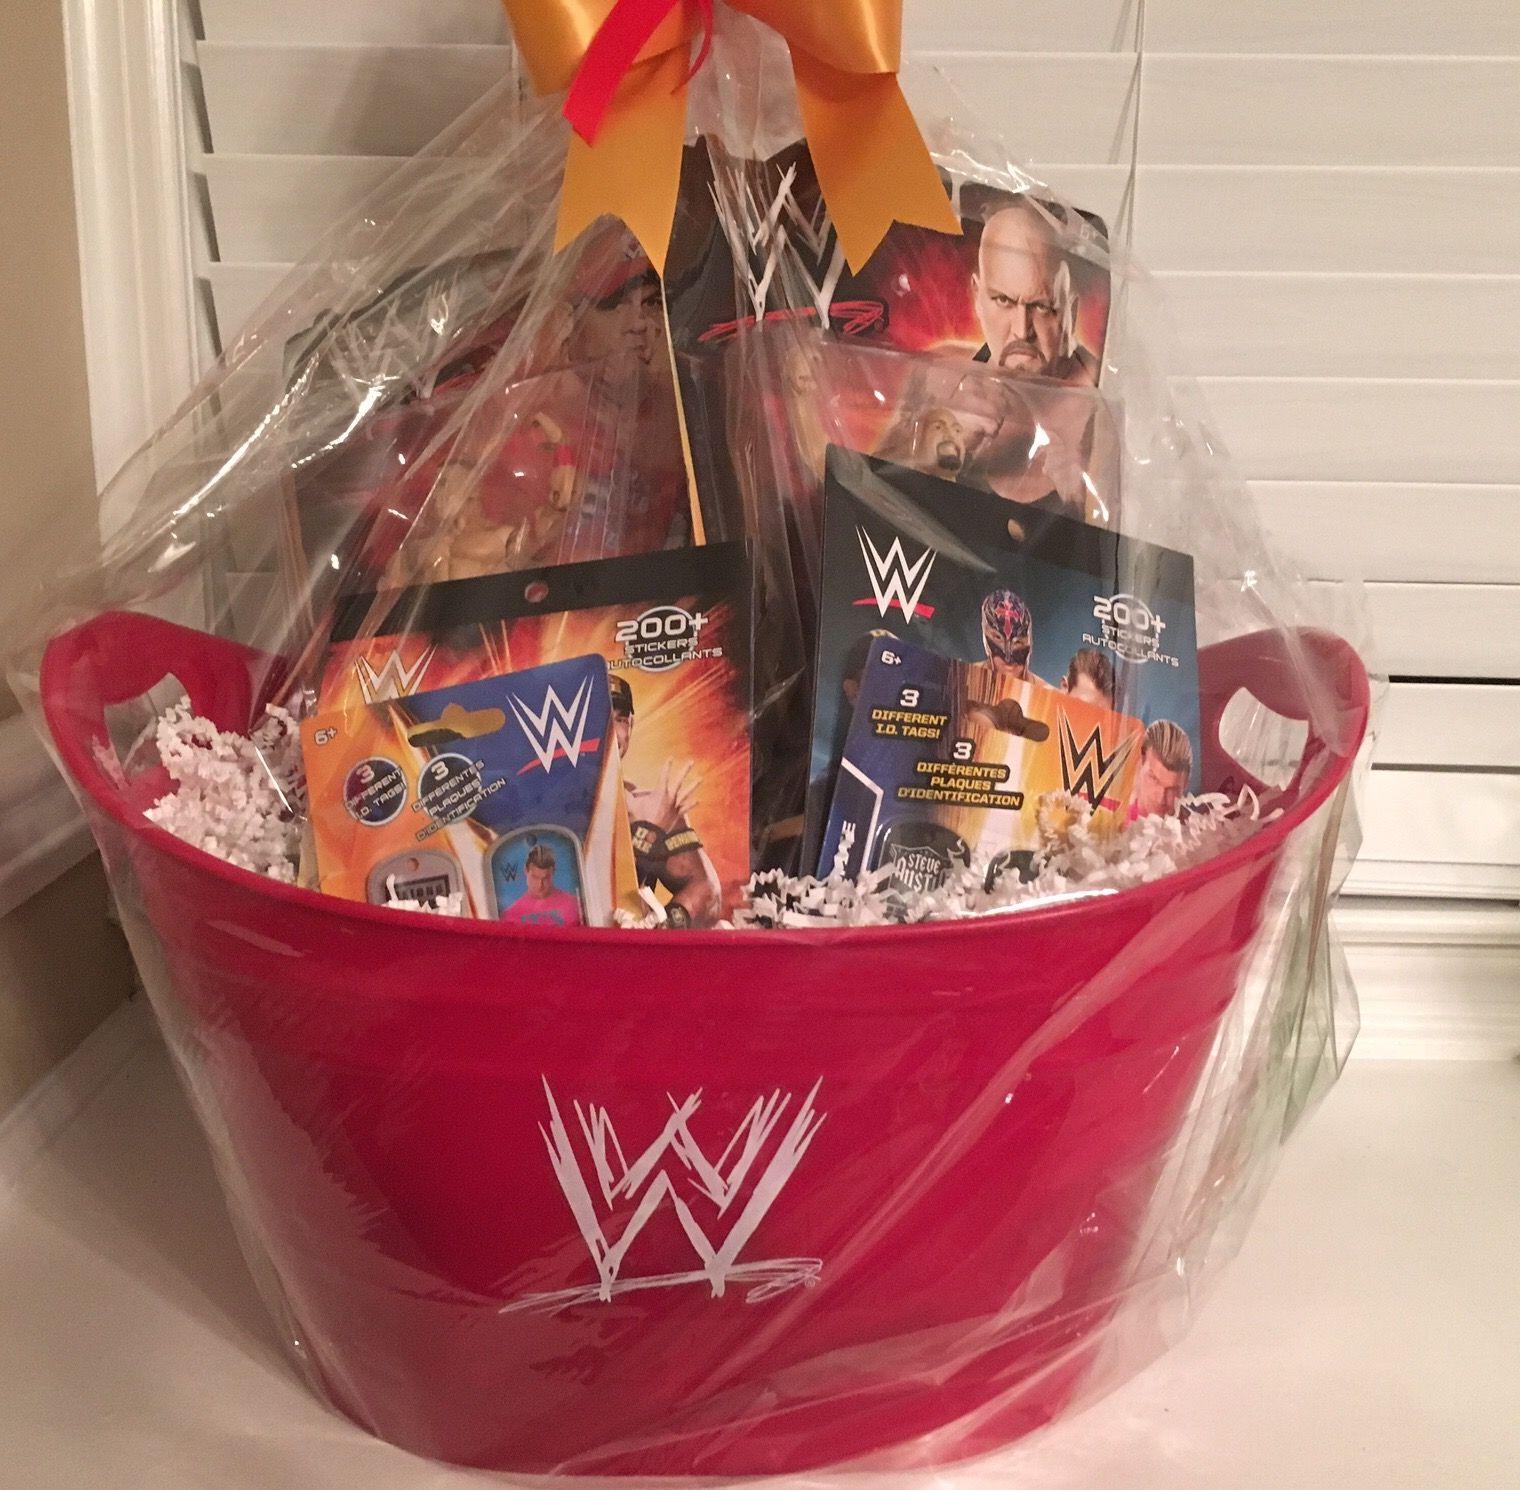 Wwe gift basket lbm pinterest easter and easter baskets wwe gift basket negle Images